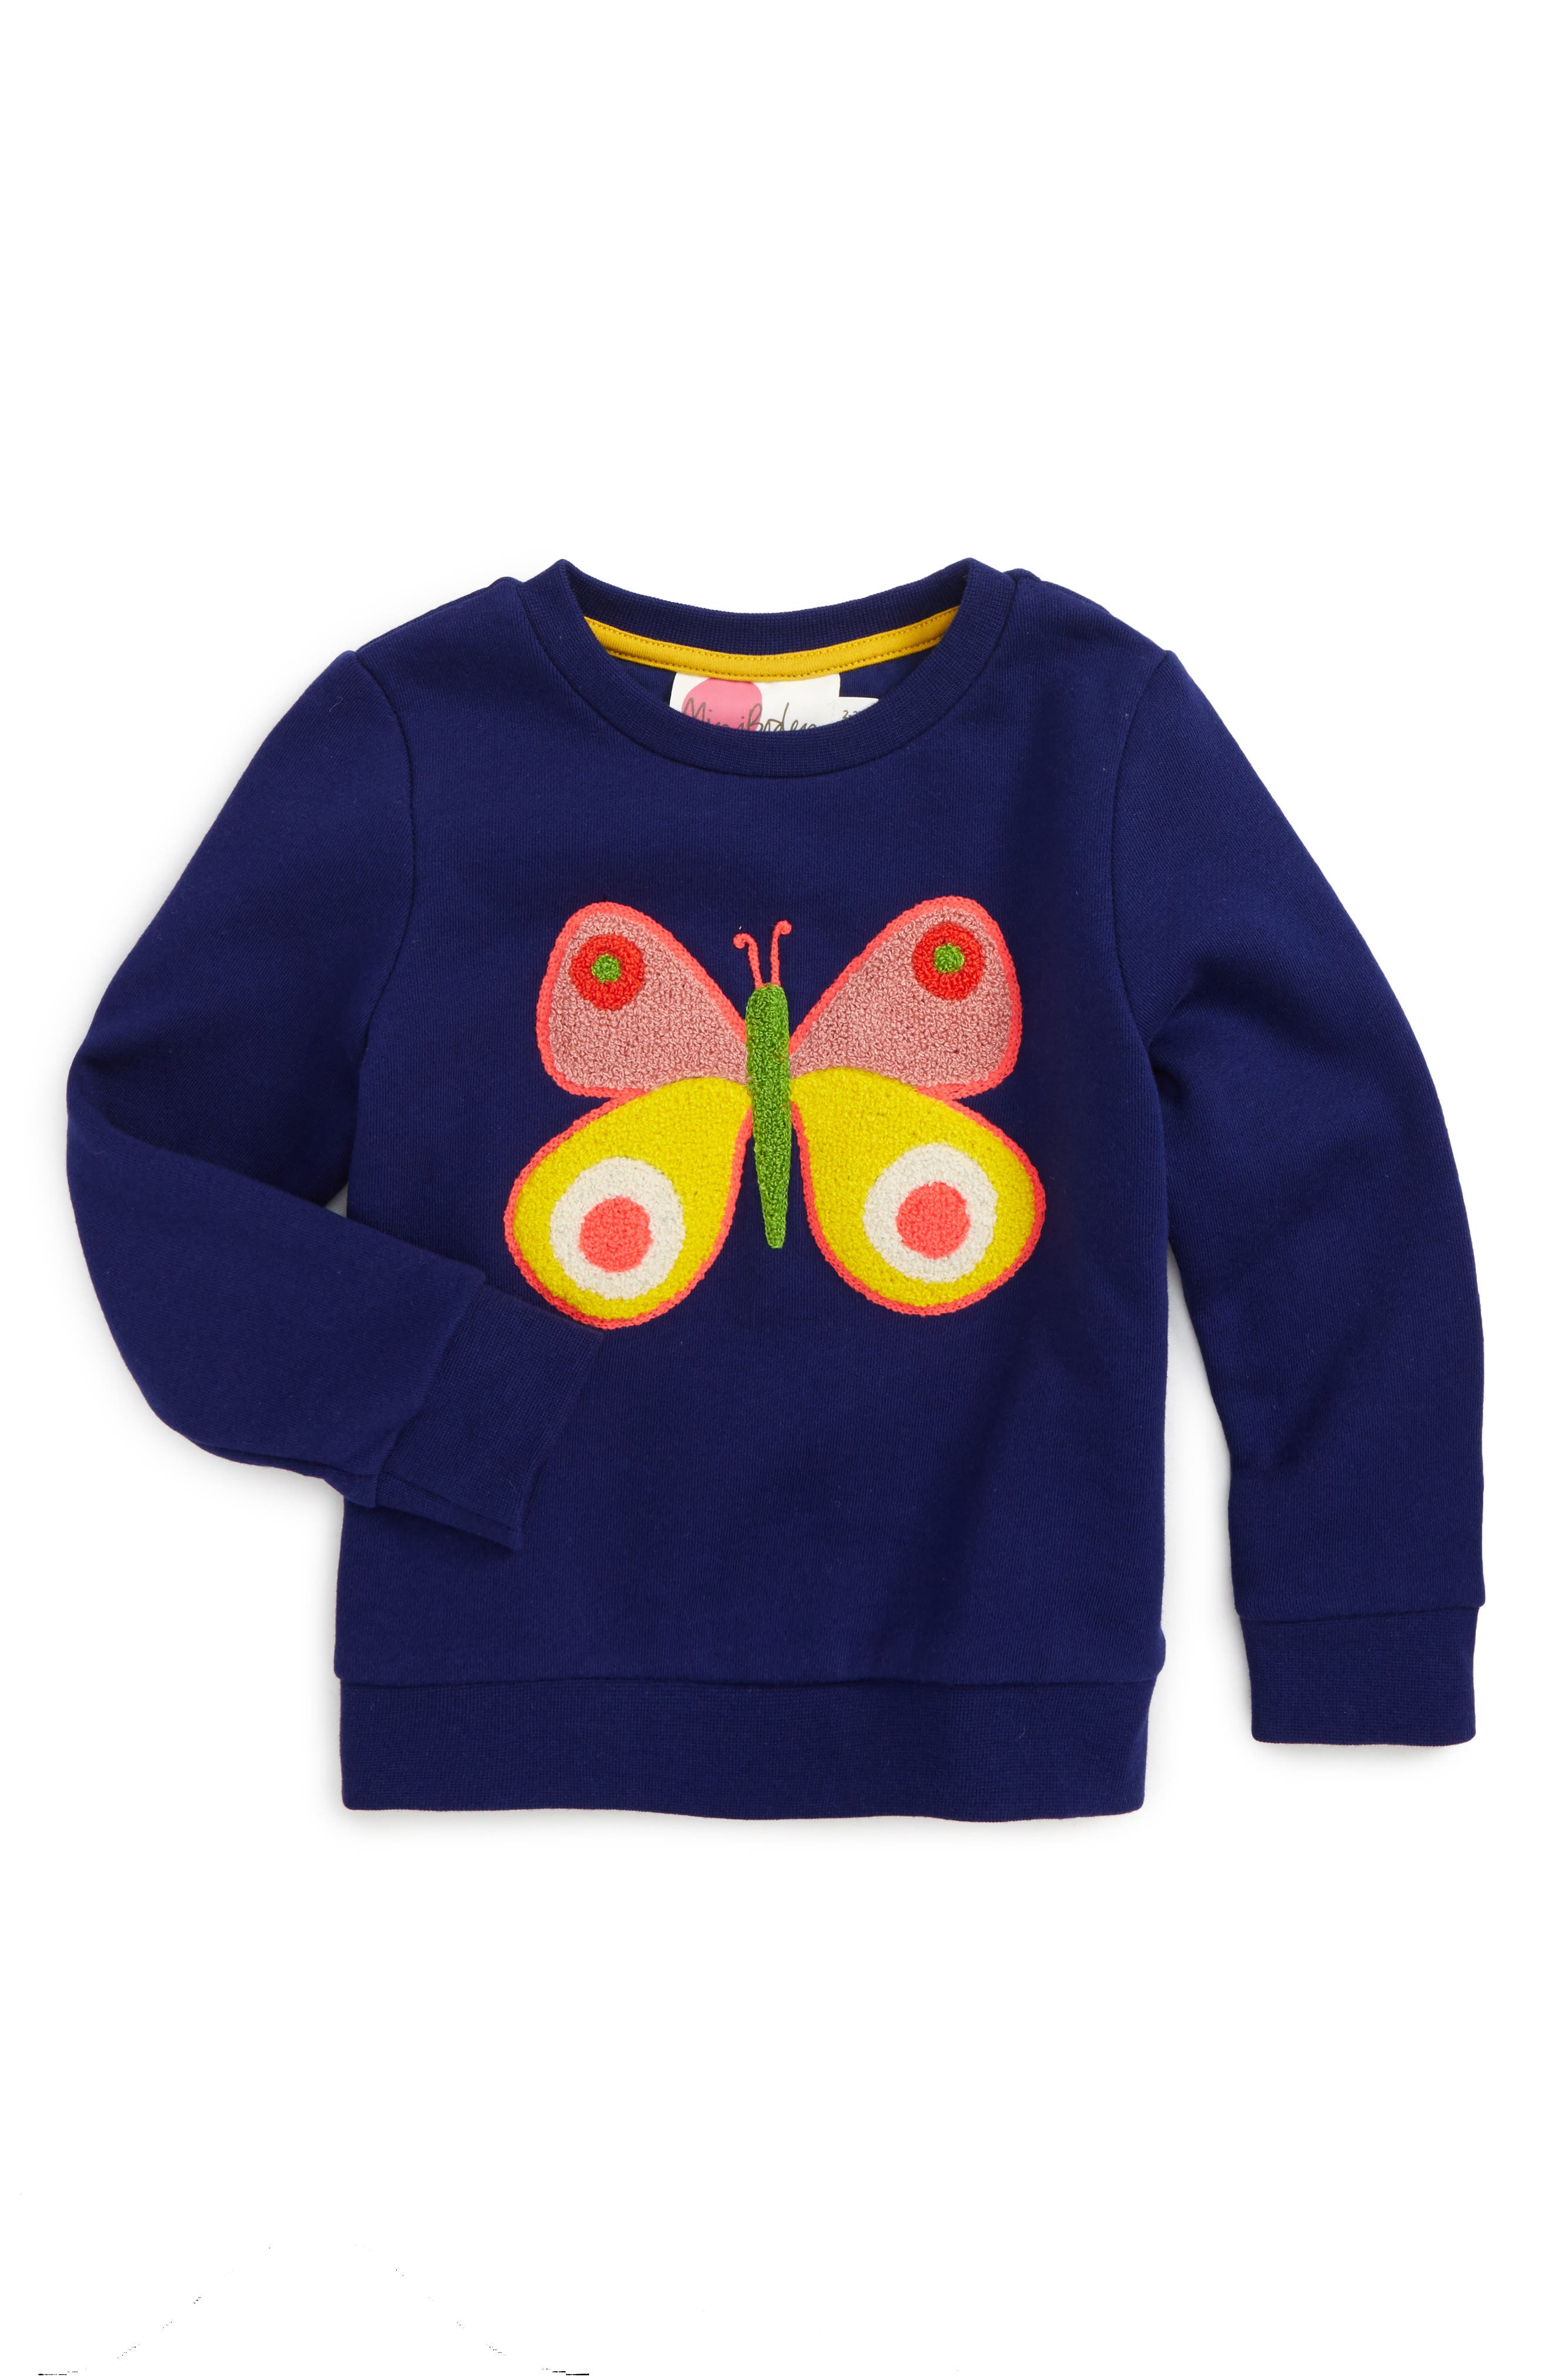 Bouclé Embroidered Sweatshirt,                             Main thumbnail 1, color,                             414